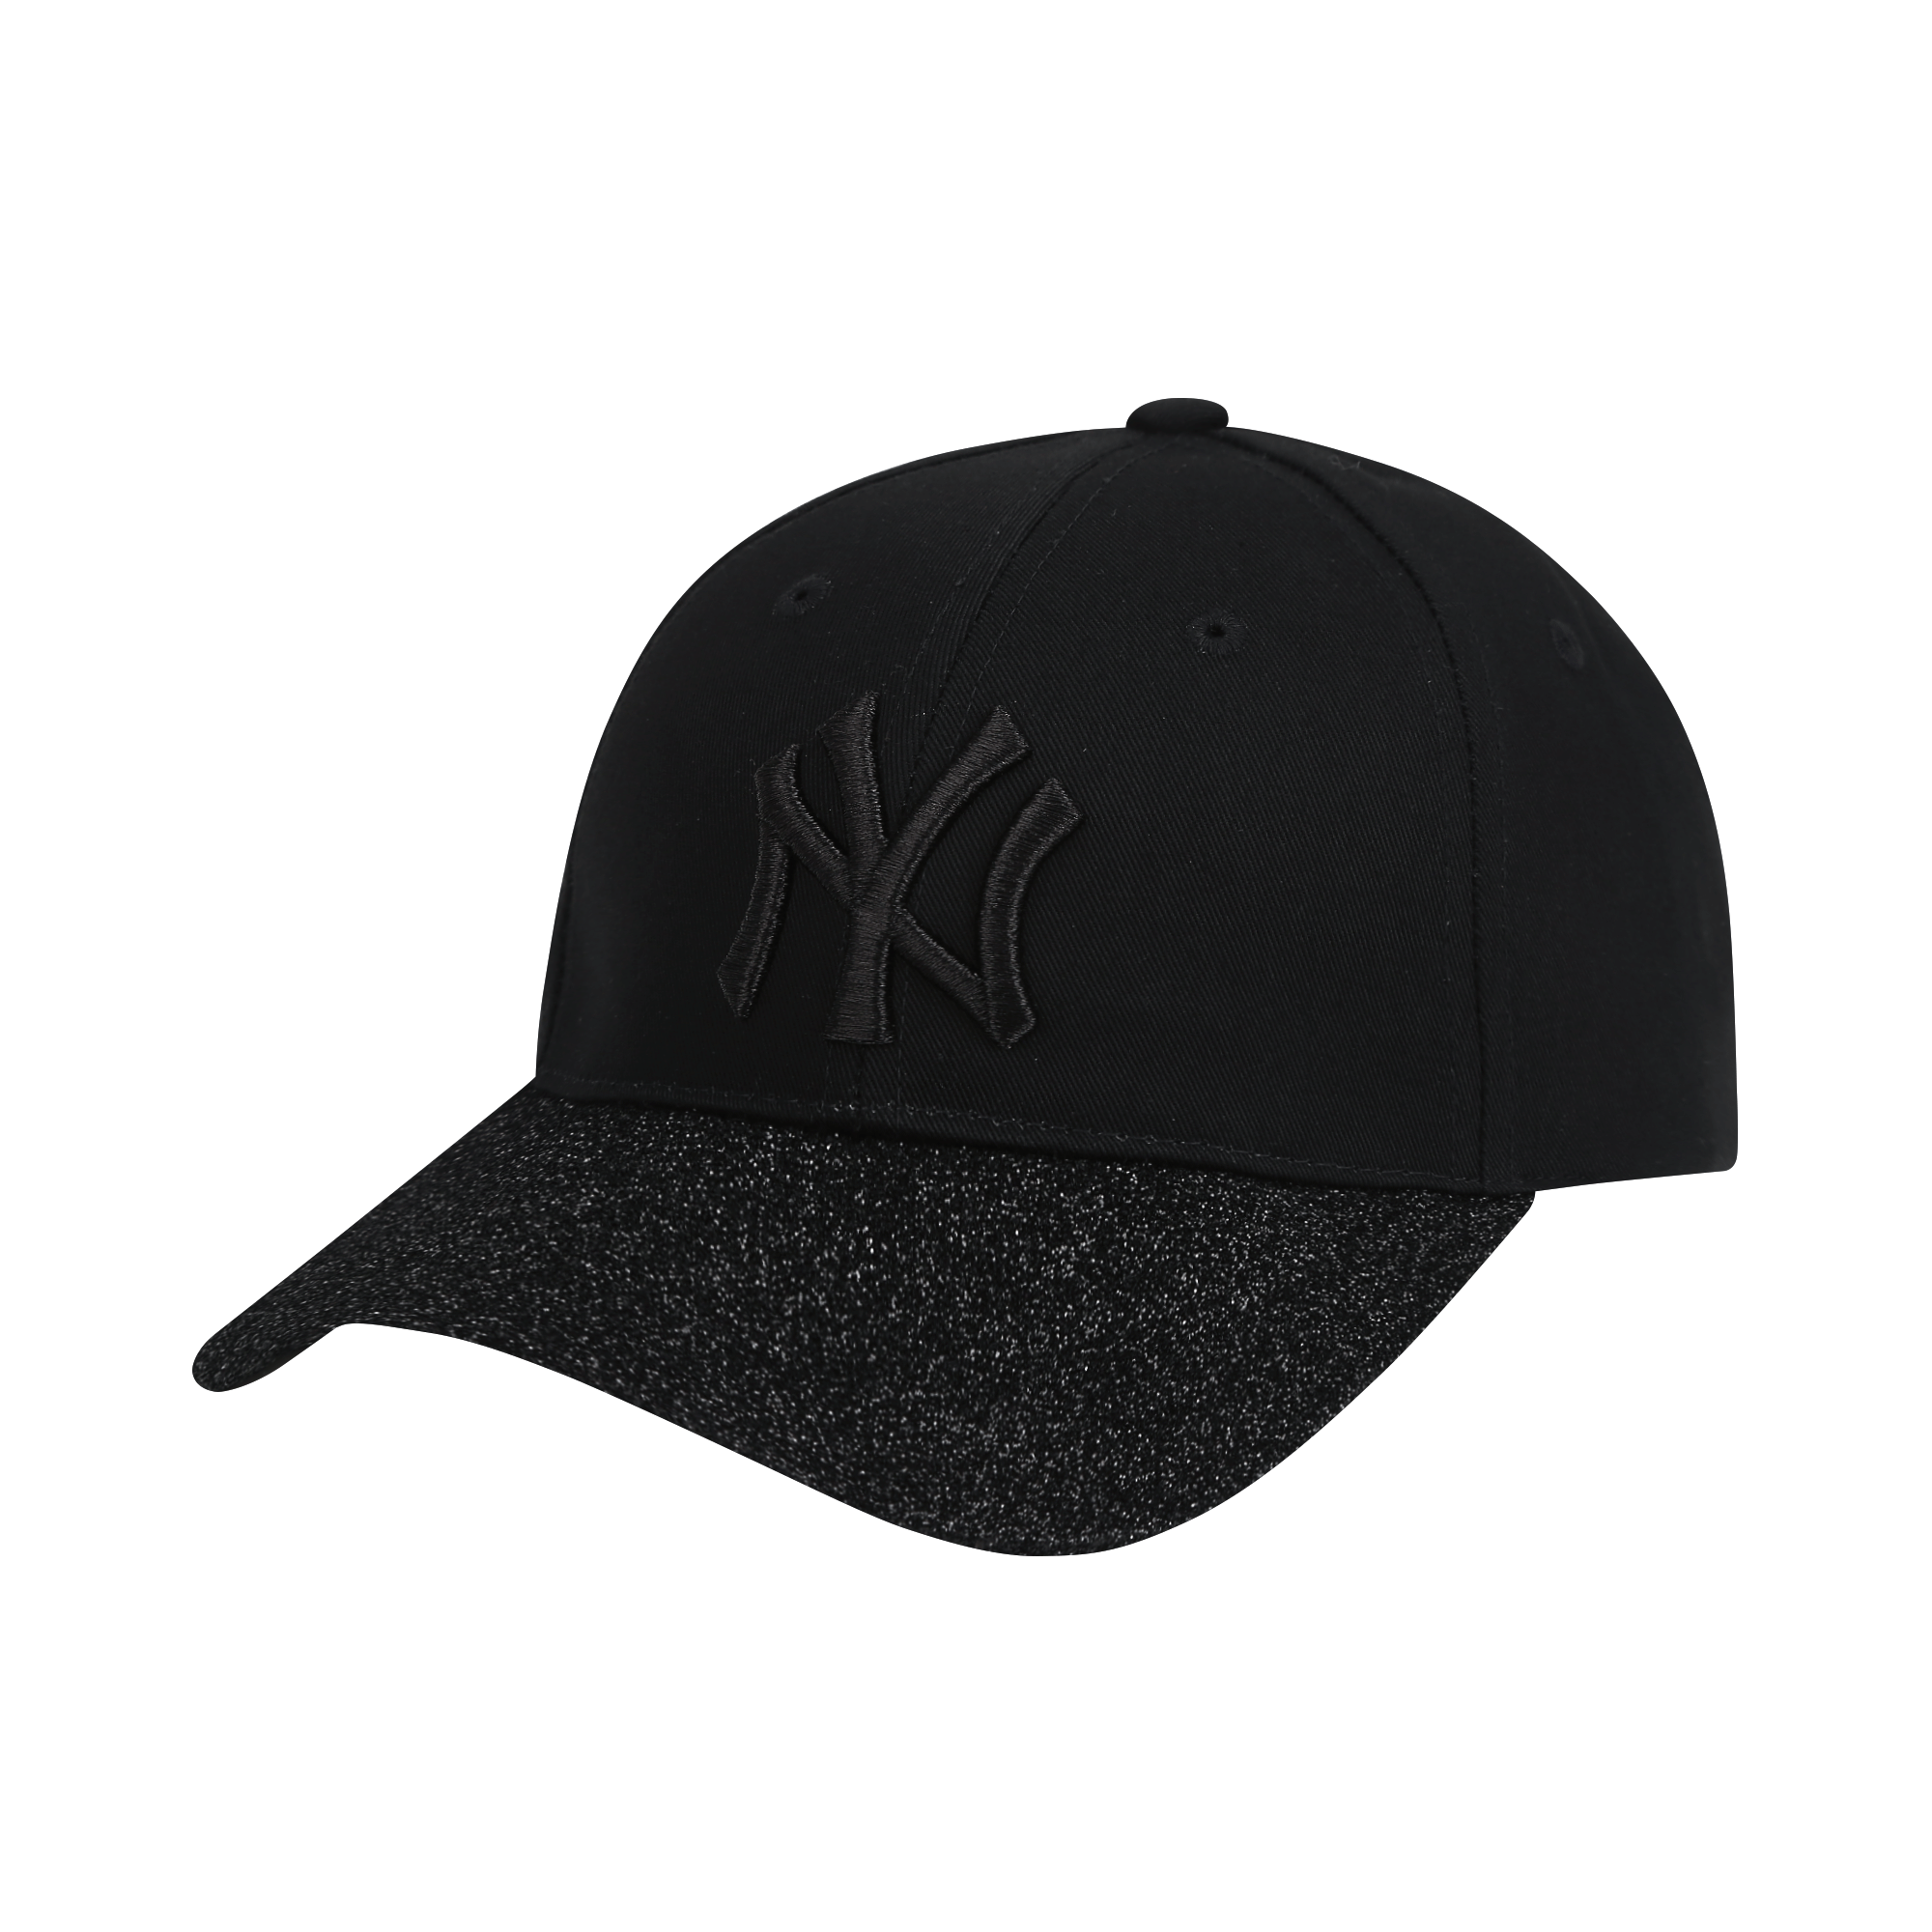 NEW YORK YANKEES GLITTER CURVED CAP